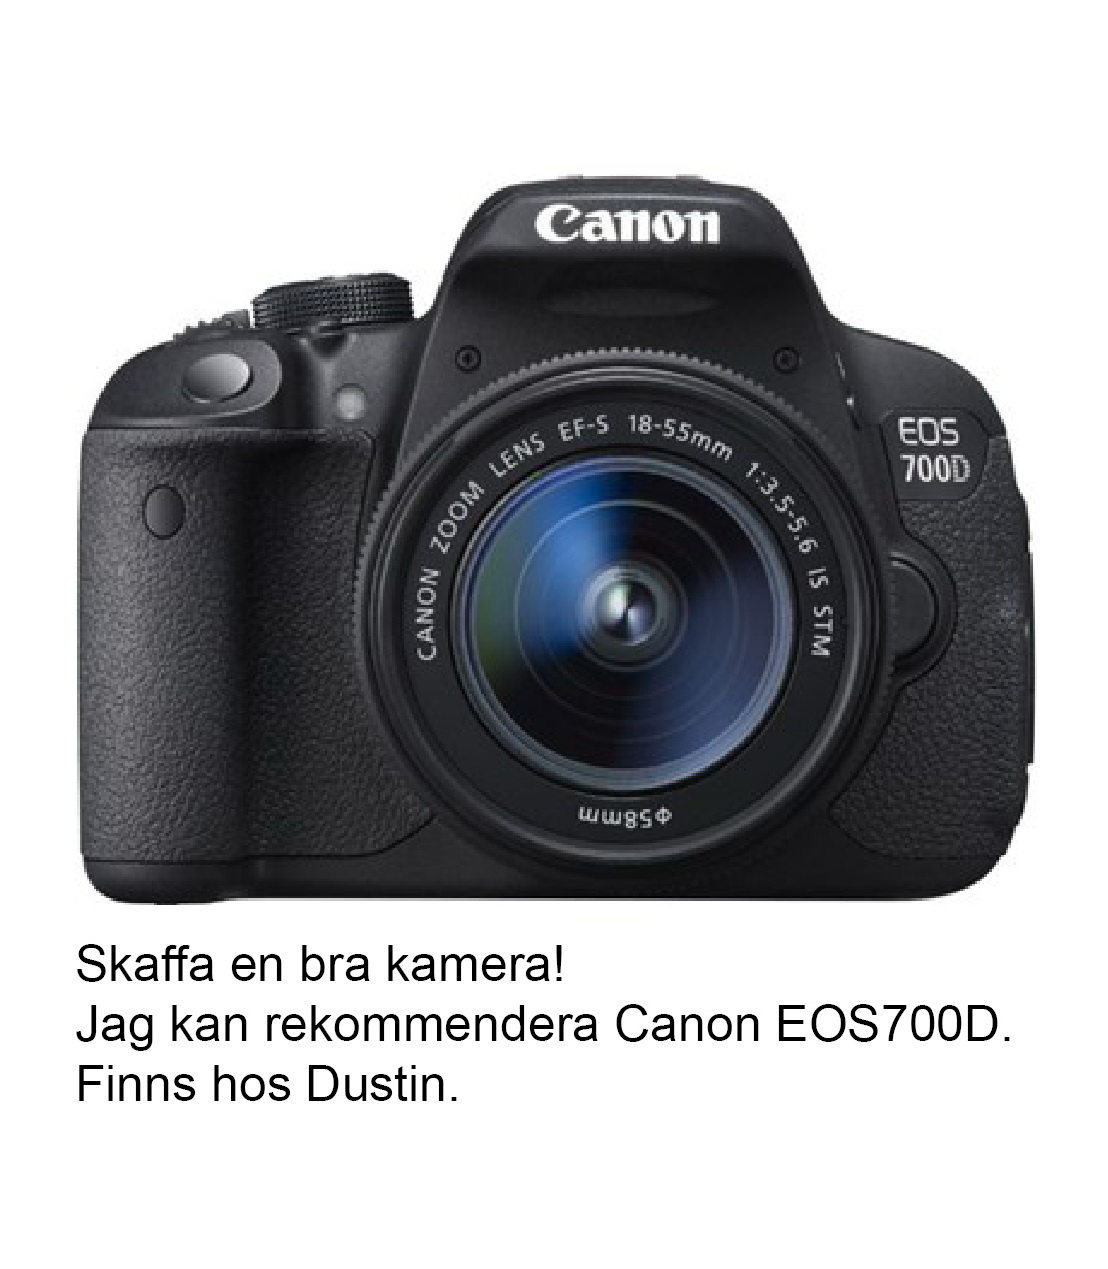 canon-eos-700d-med-text